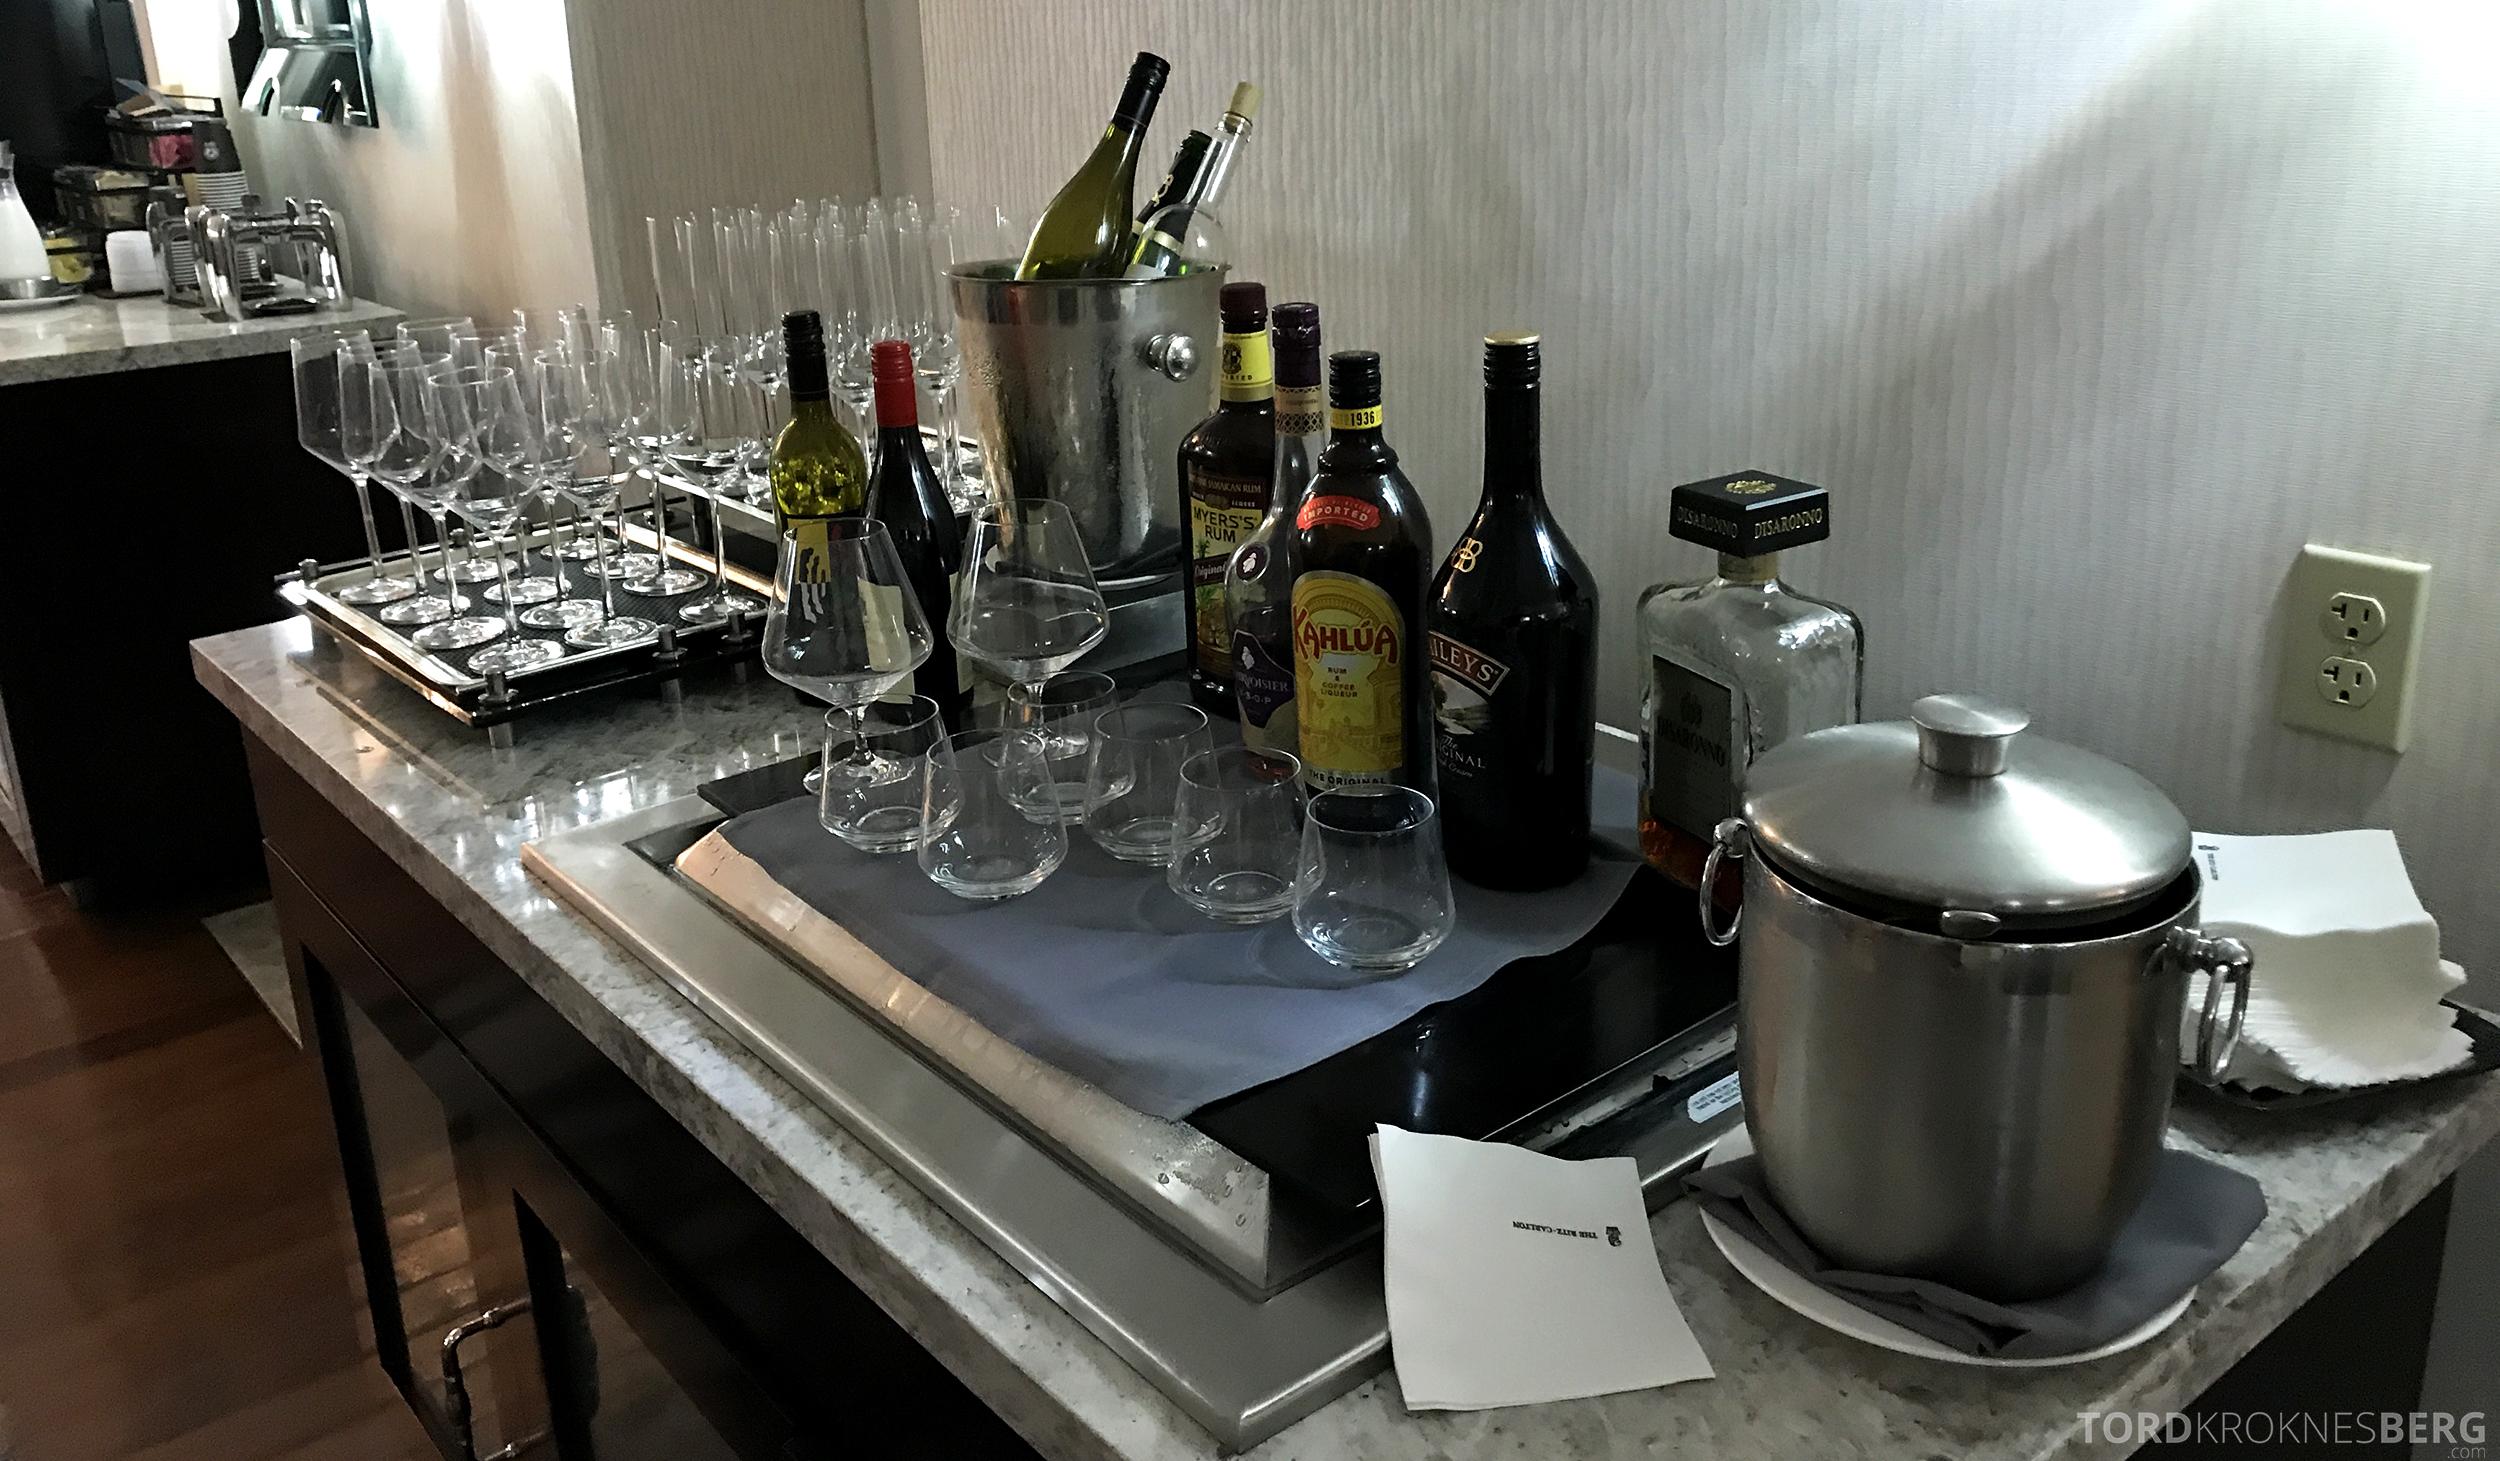 Ritz-Carlton San Francisco Hotel Club Lounge brennevin